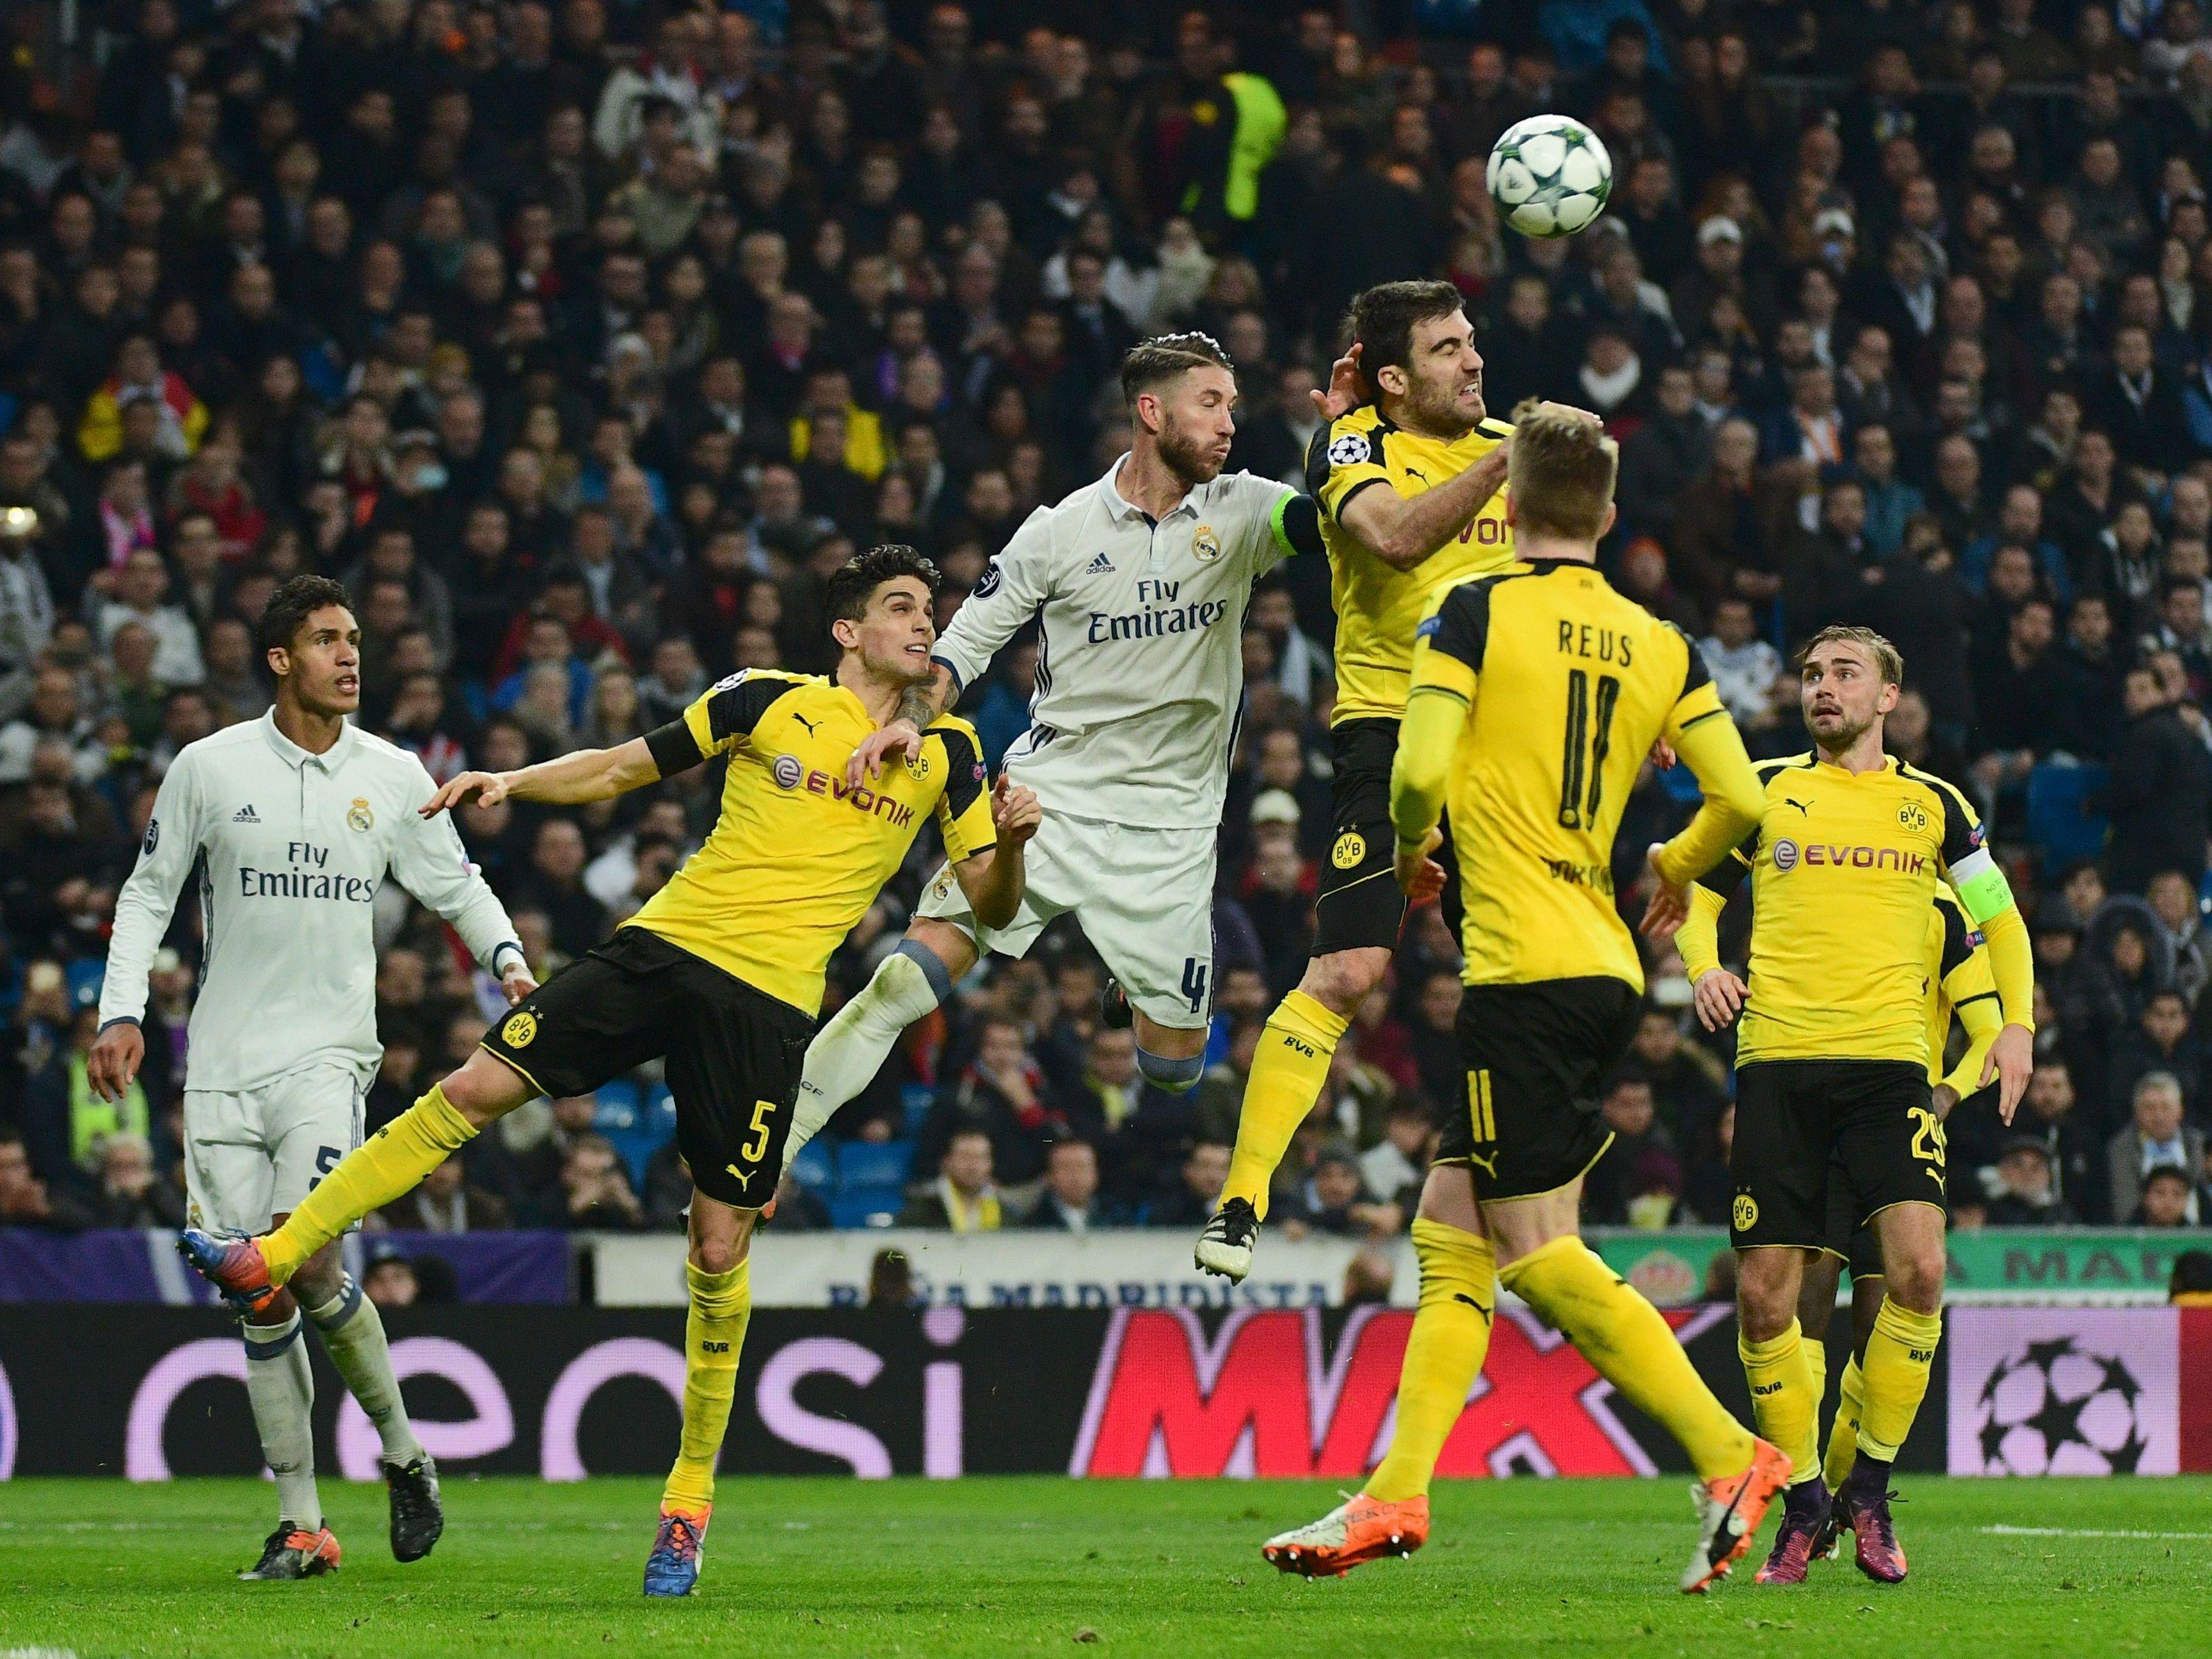 Borussia Dortmund Bvb Gegen Real Madrid Live Stream Tv